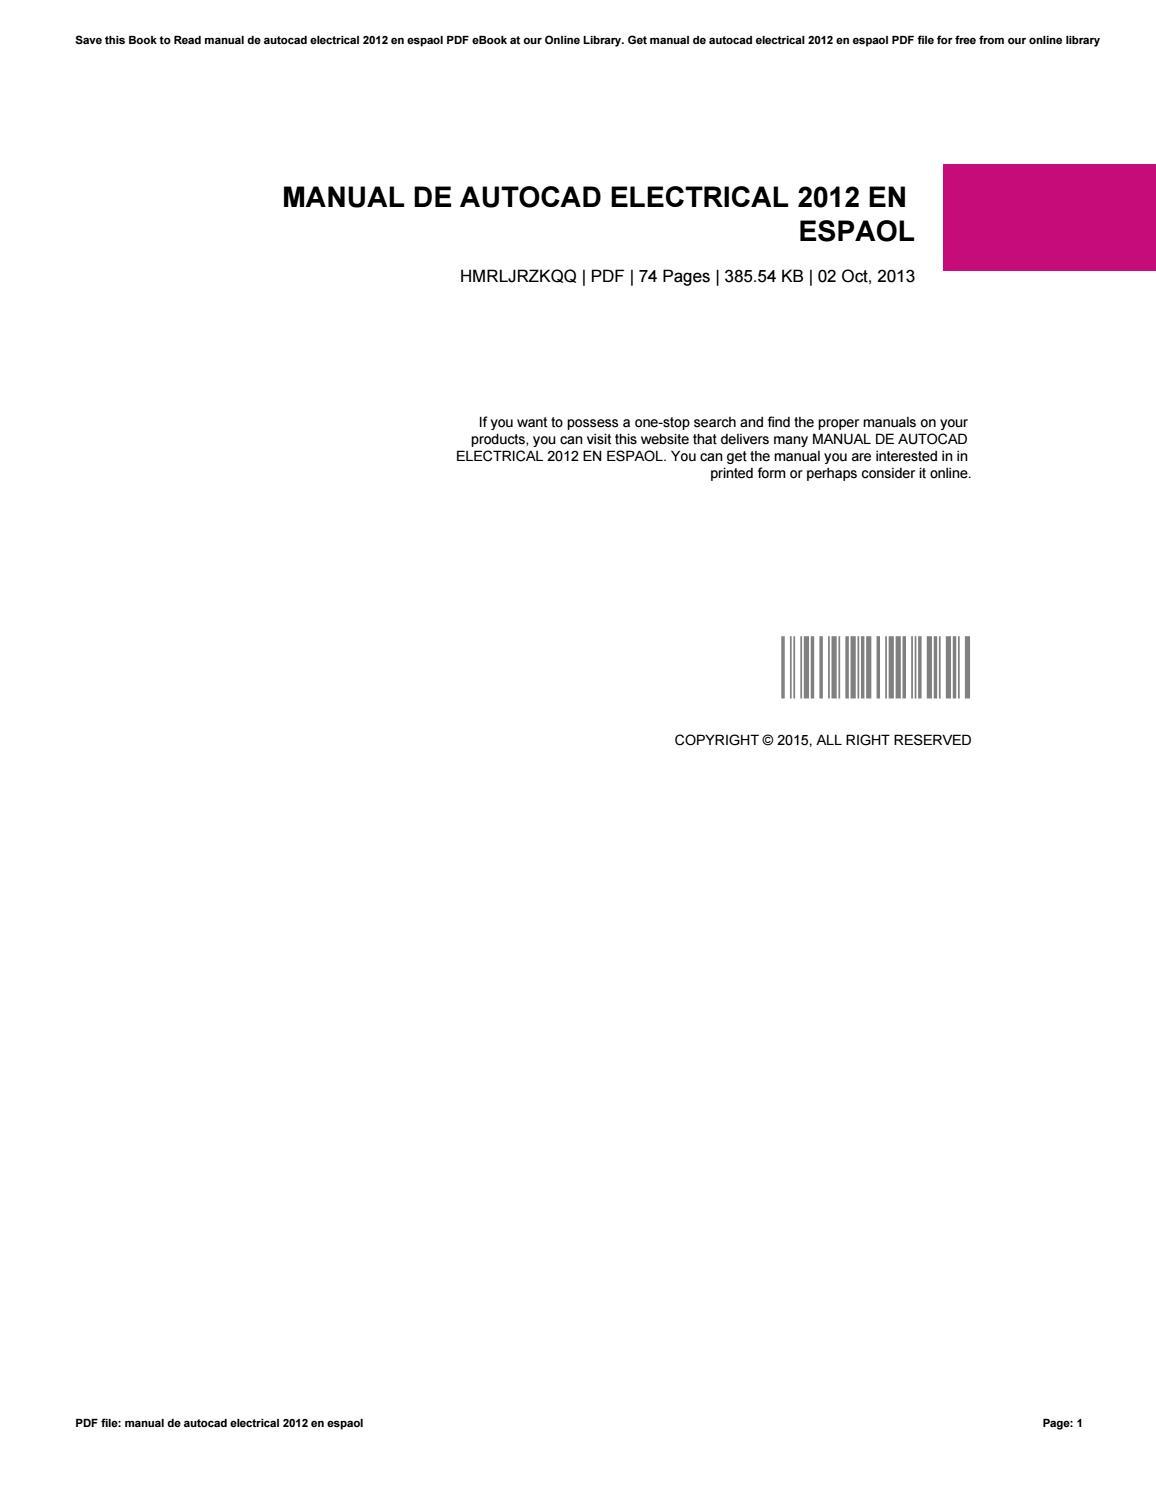 Electrical book black autocad pdf 2015